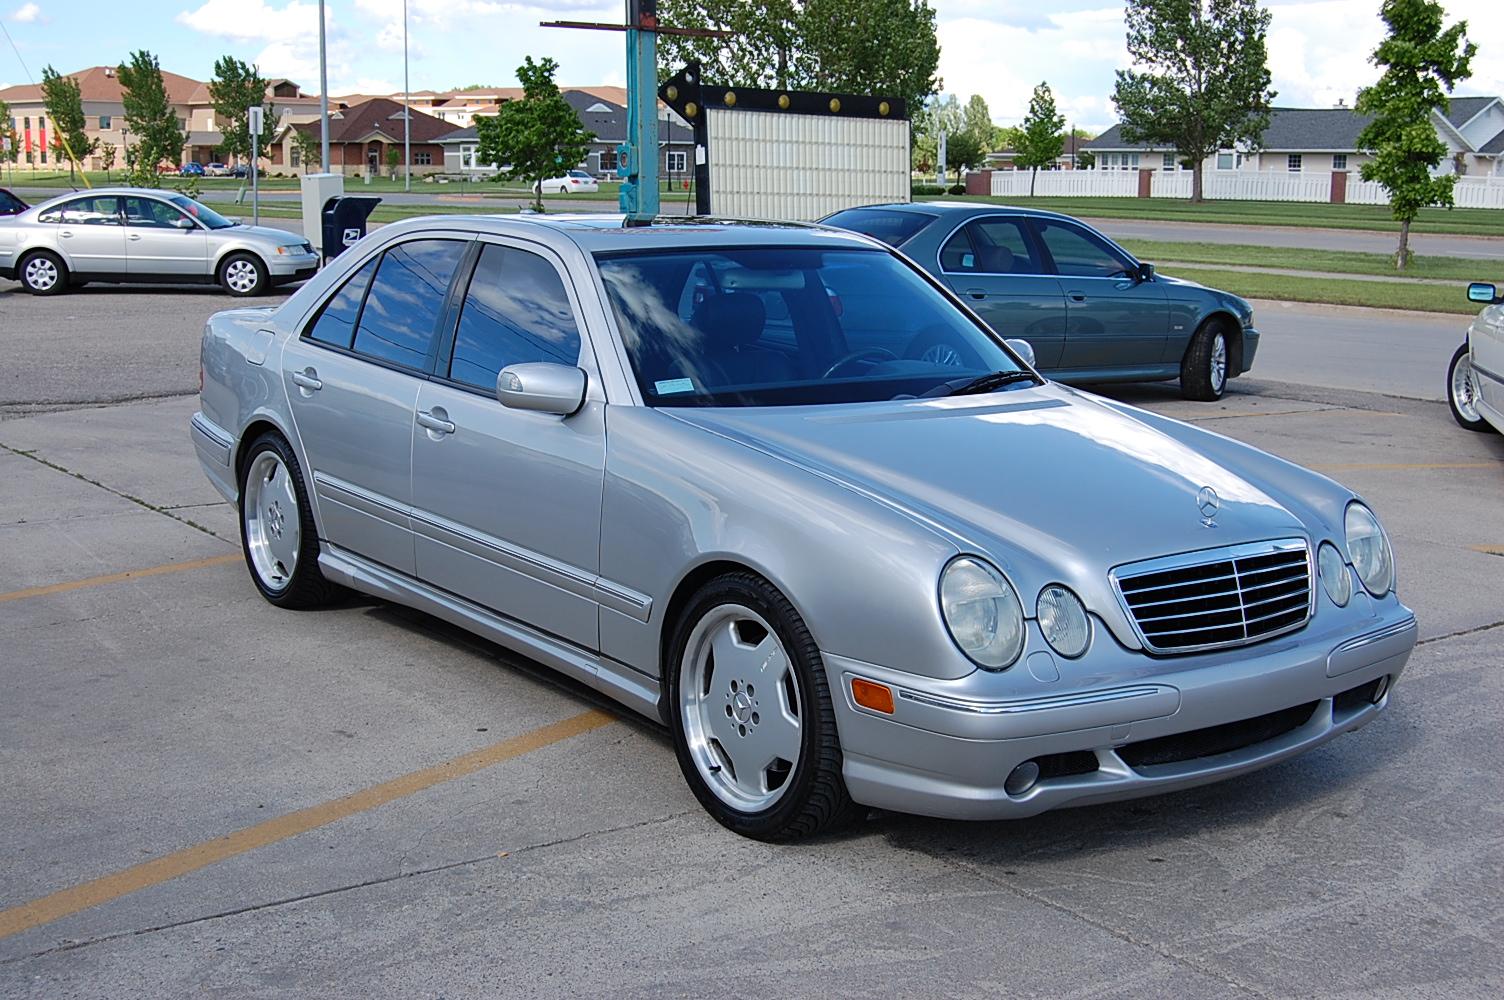 1999 mercedes benz e55 amg image 3 for Mercedes benz of dayton